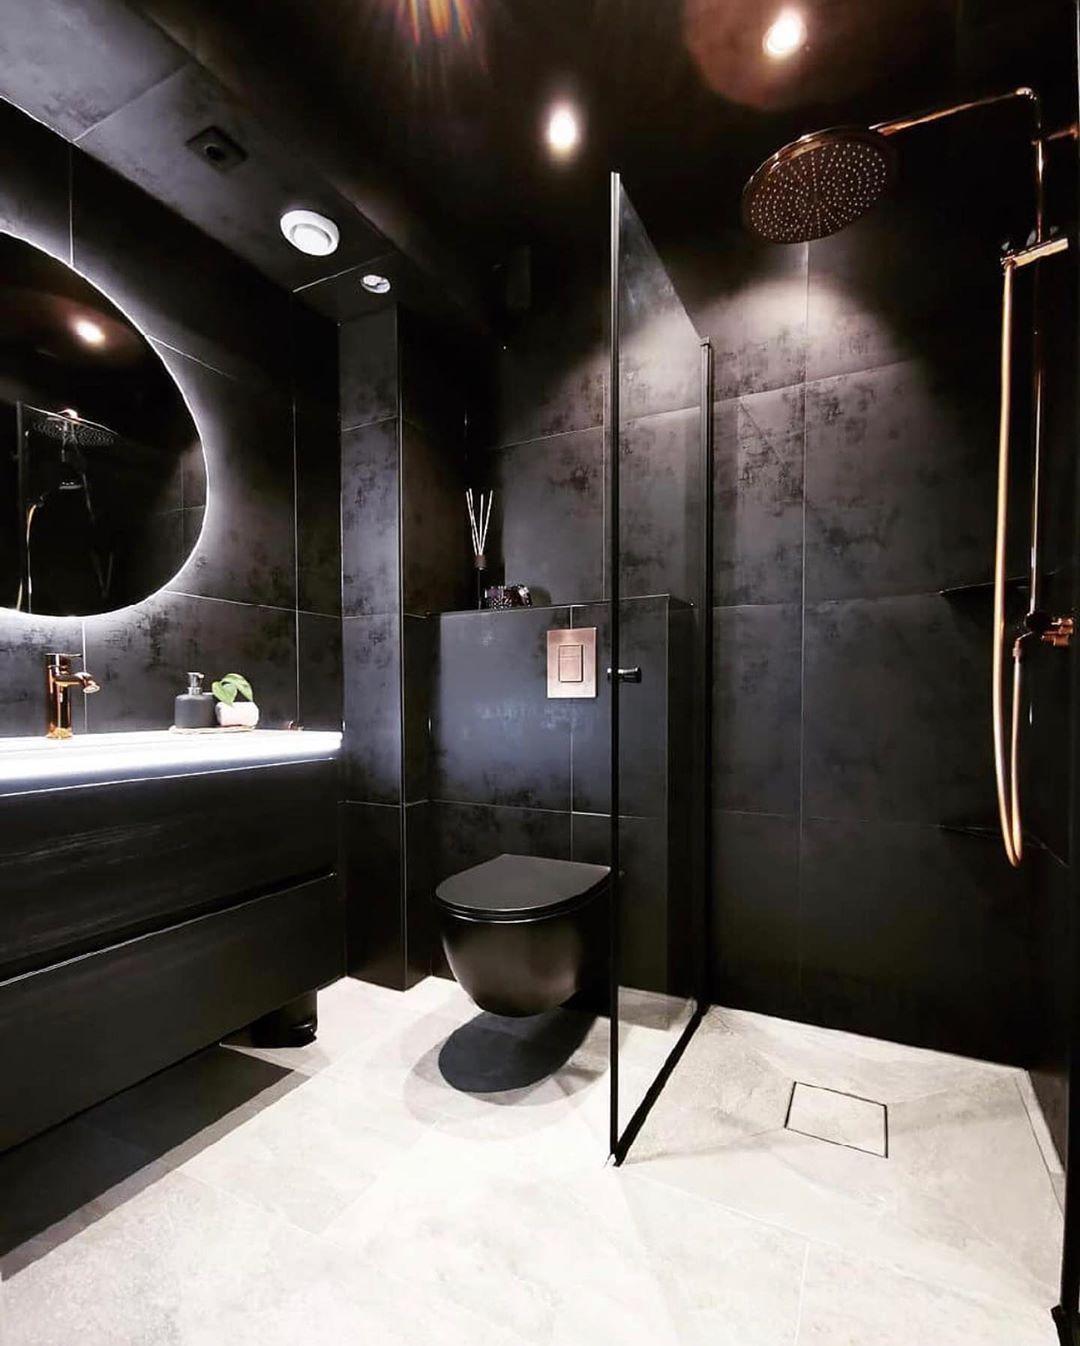 Luxury Buildings Interiors On Instagram Bathroom Goals By Igoldbeer Swipe Left To Bathroom Design Luxury Modern Bathroom Design Bathroom Interior Design Viral home designer bathroom design